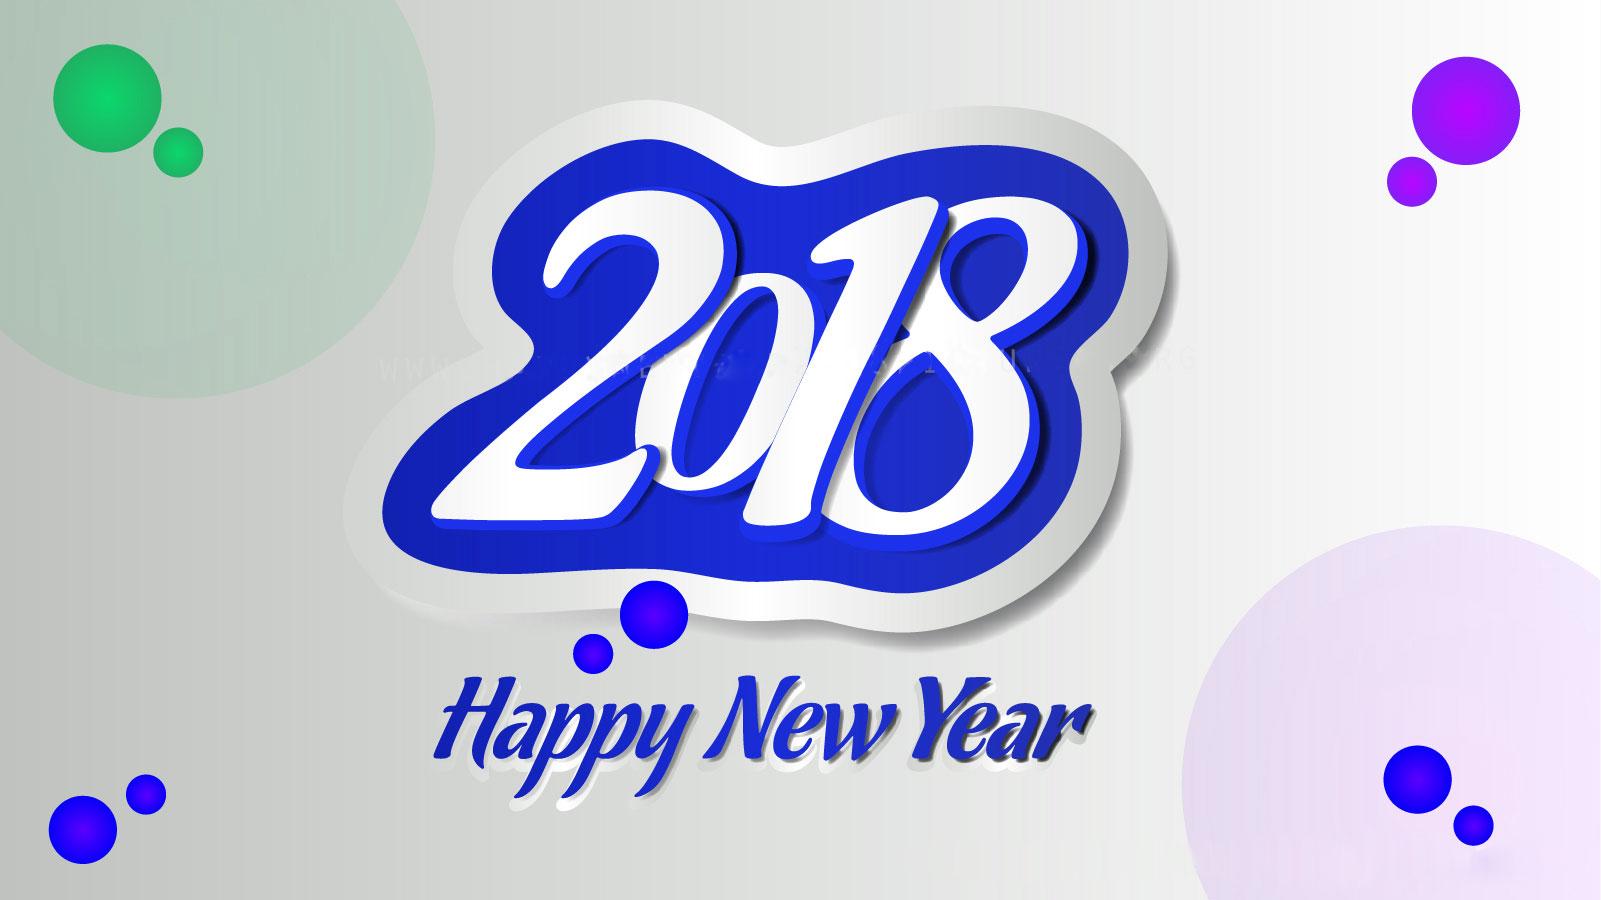 1601x900 px 2018 wallpaper happy new year 2018 happy new year wallpapers hd new years wallpapers